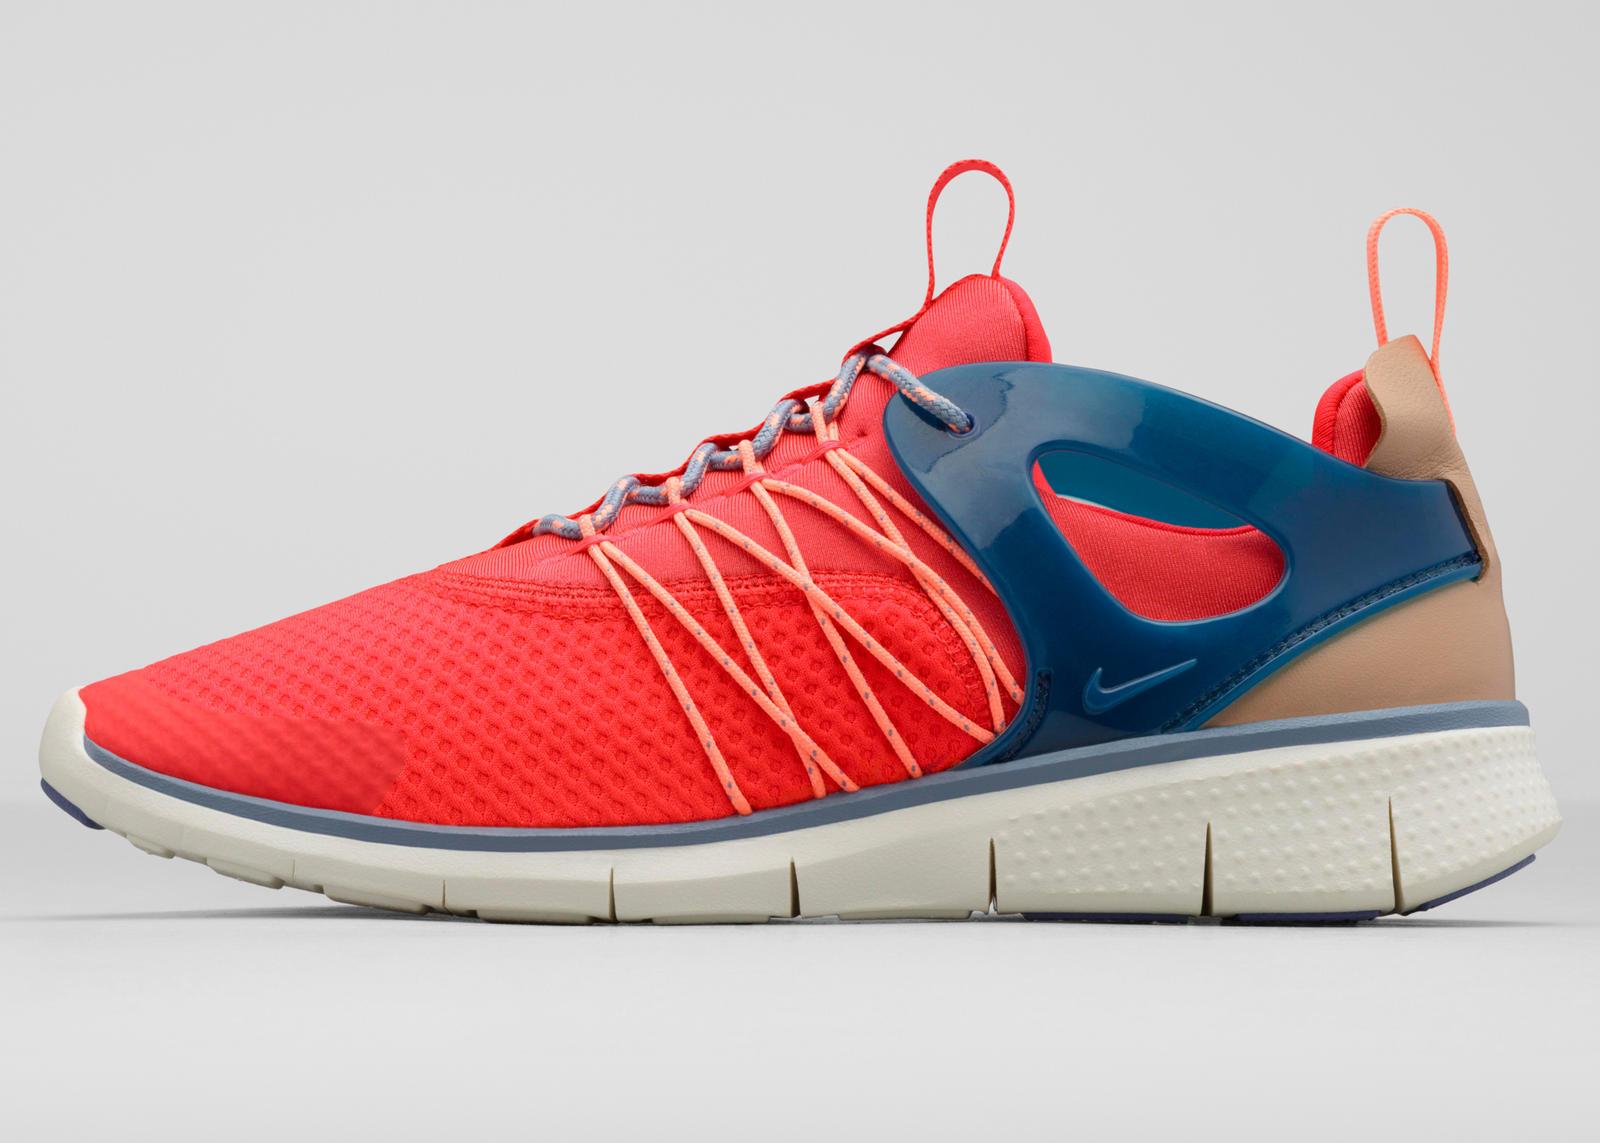 The Nike Free Viritous and Socfly